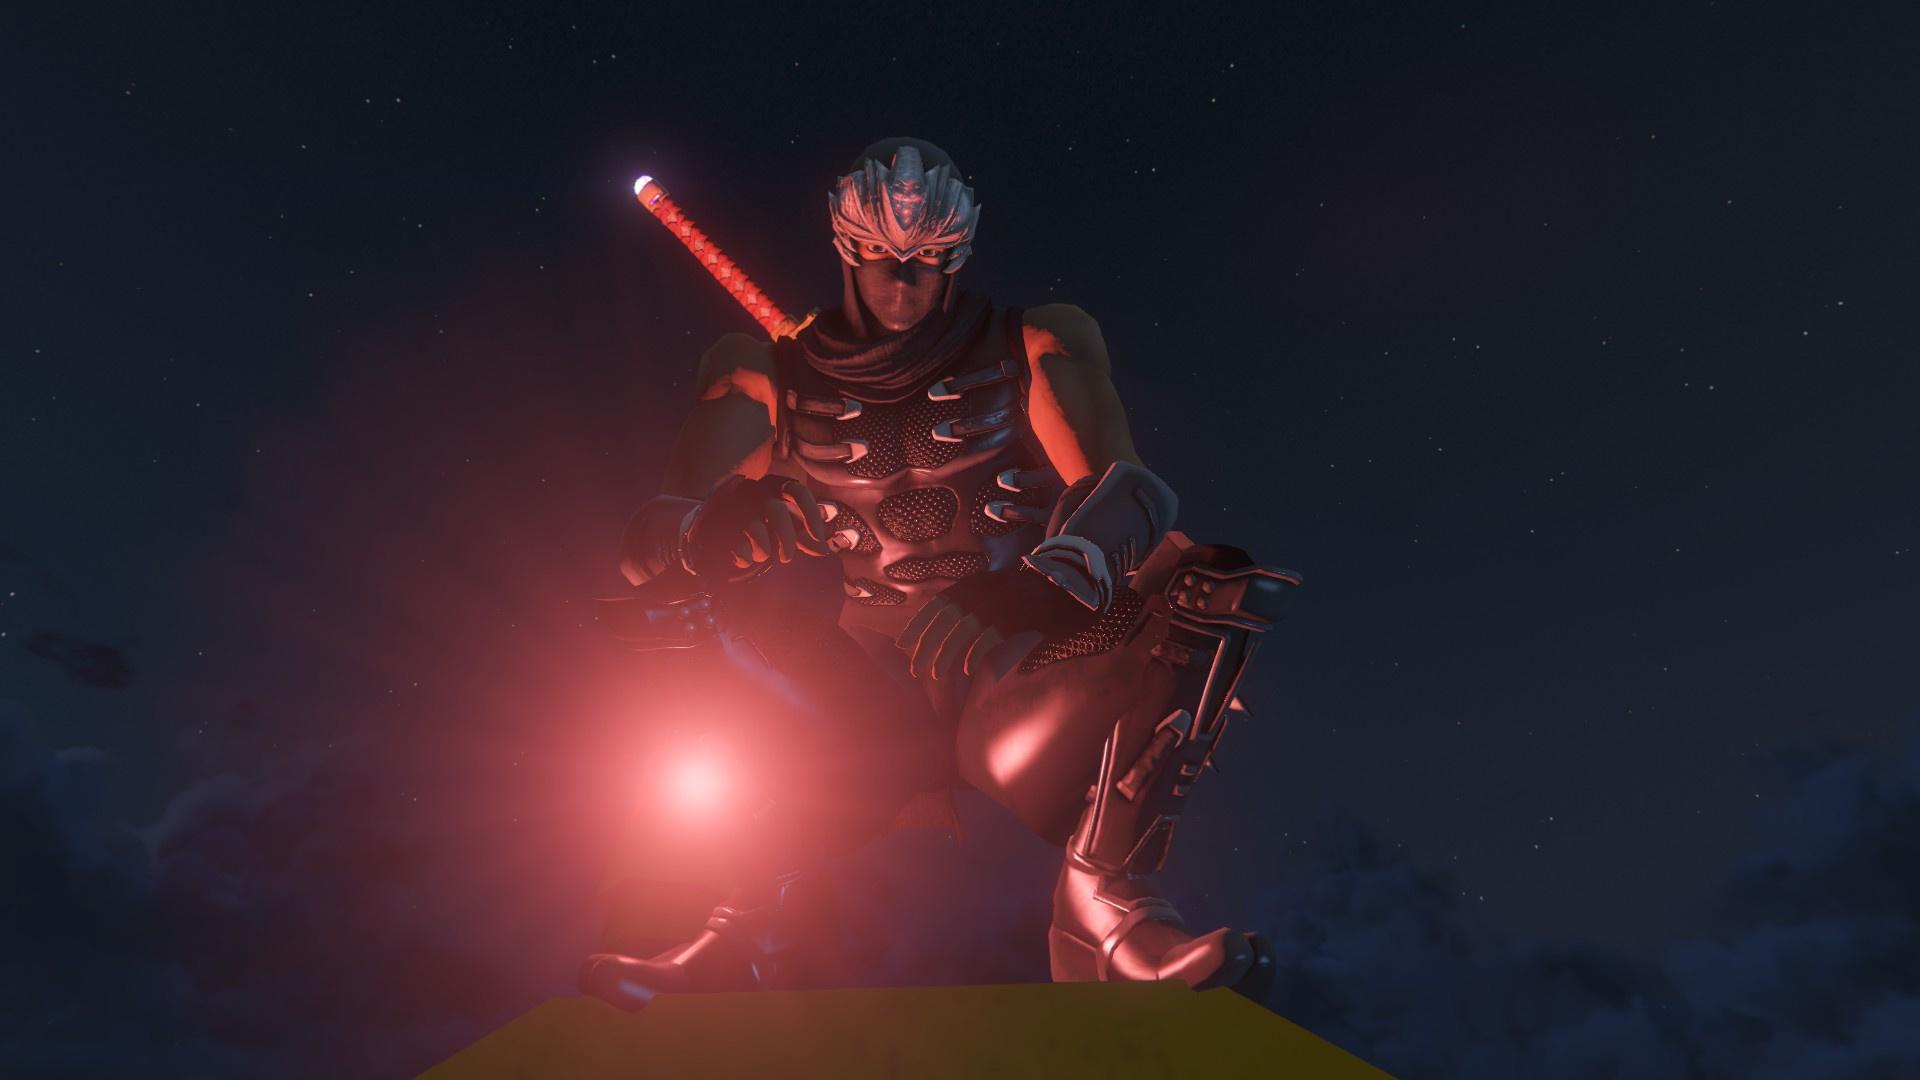 Ryu Hayabusa Ninja Gaiden 2 Gta5 Mods Com